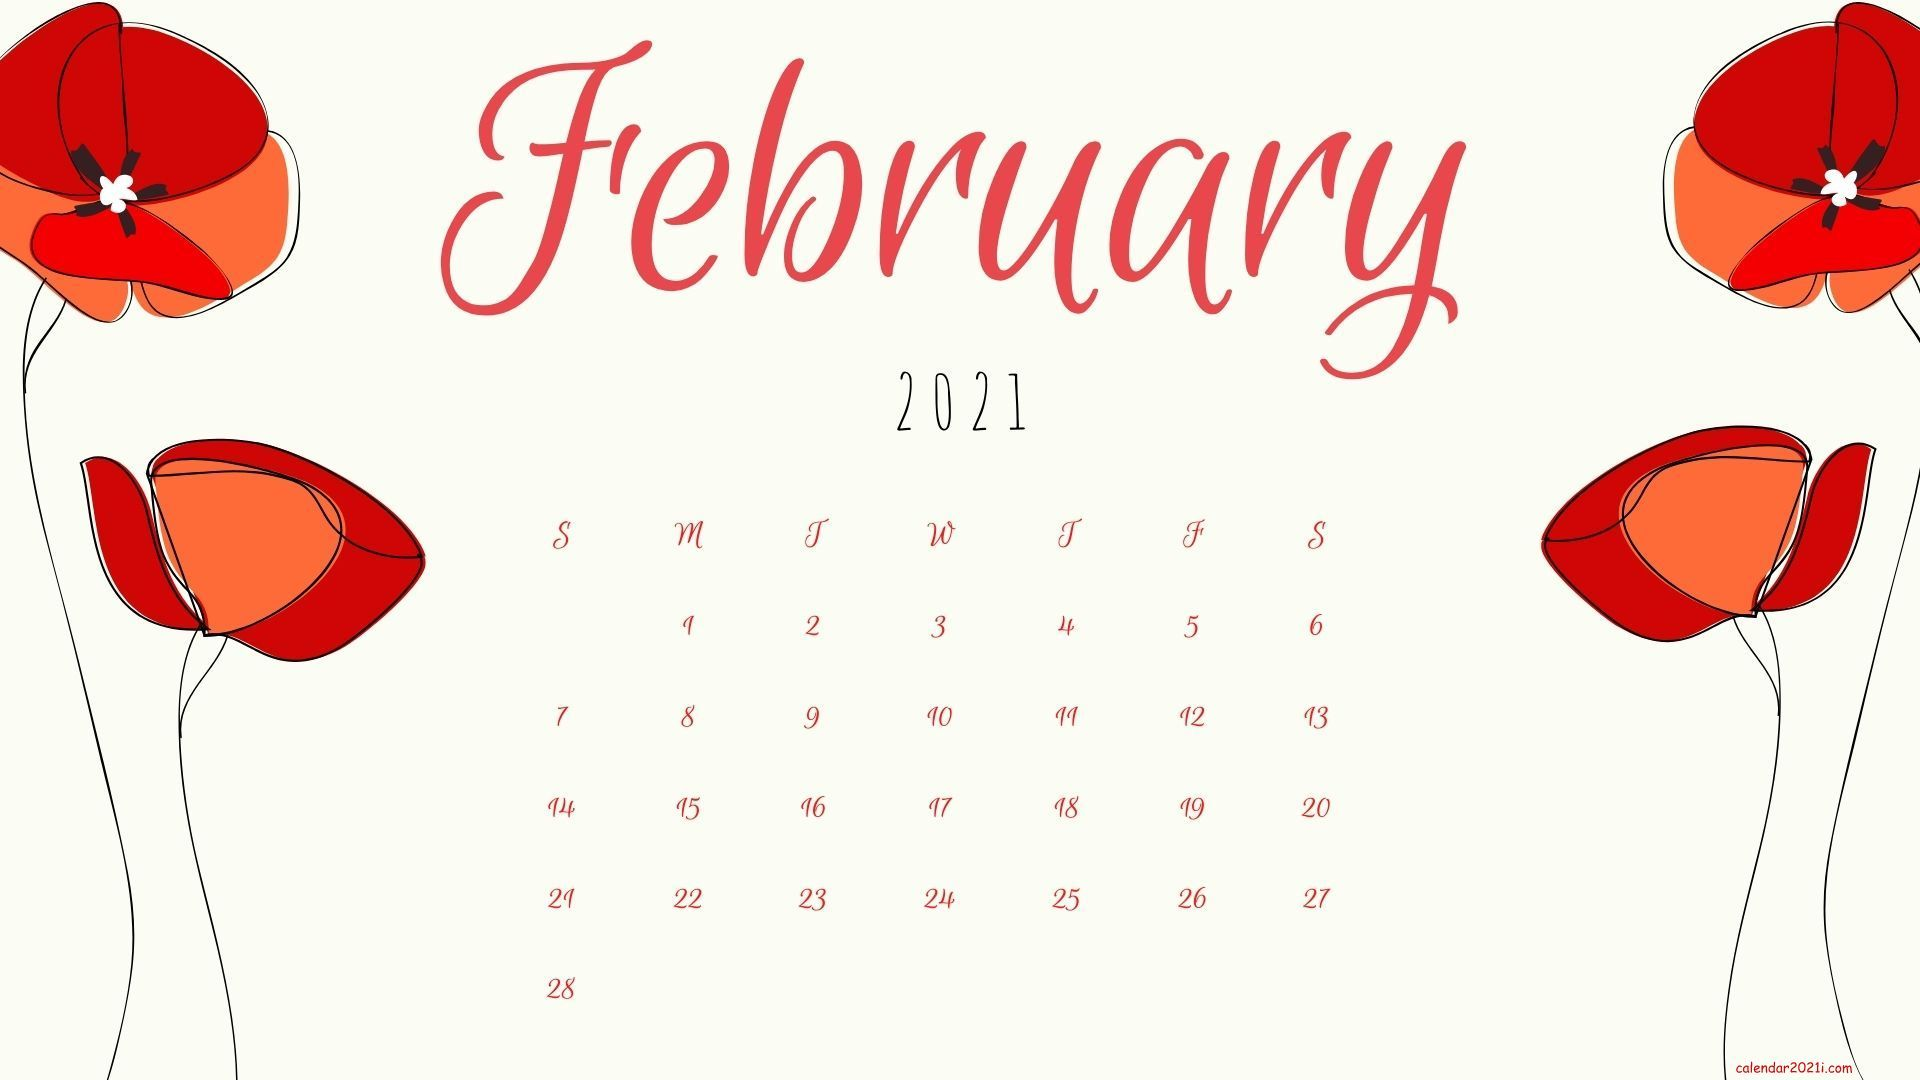 Calendar 2021 Wallpapers - Wallpaper Cave